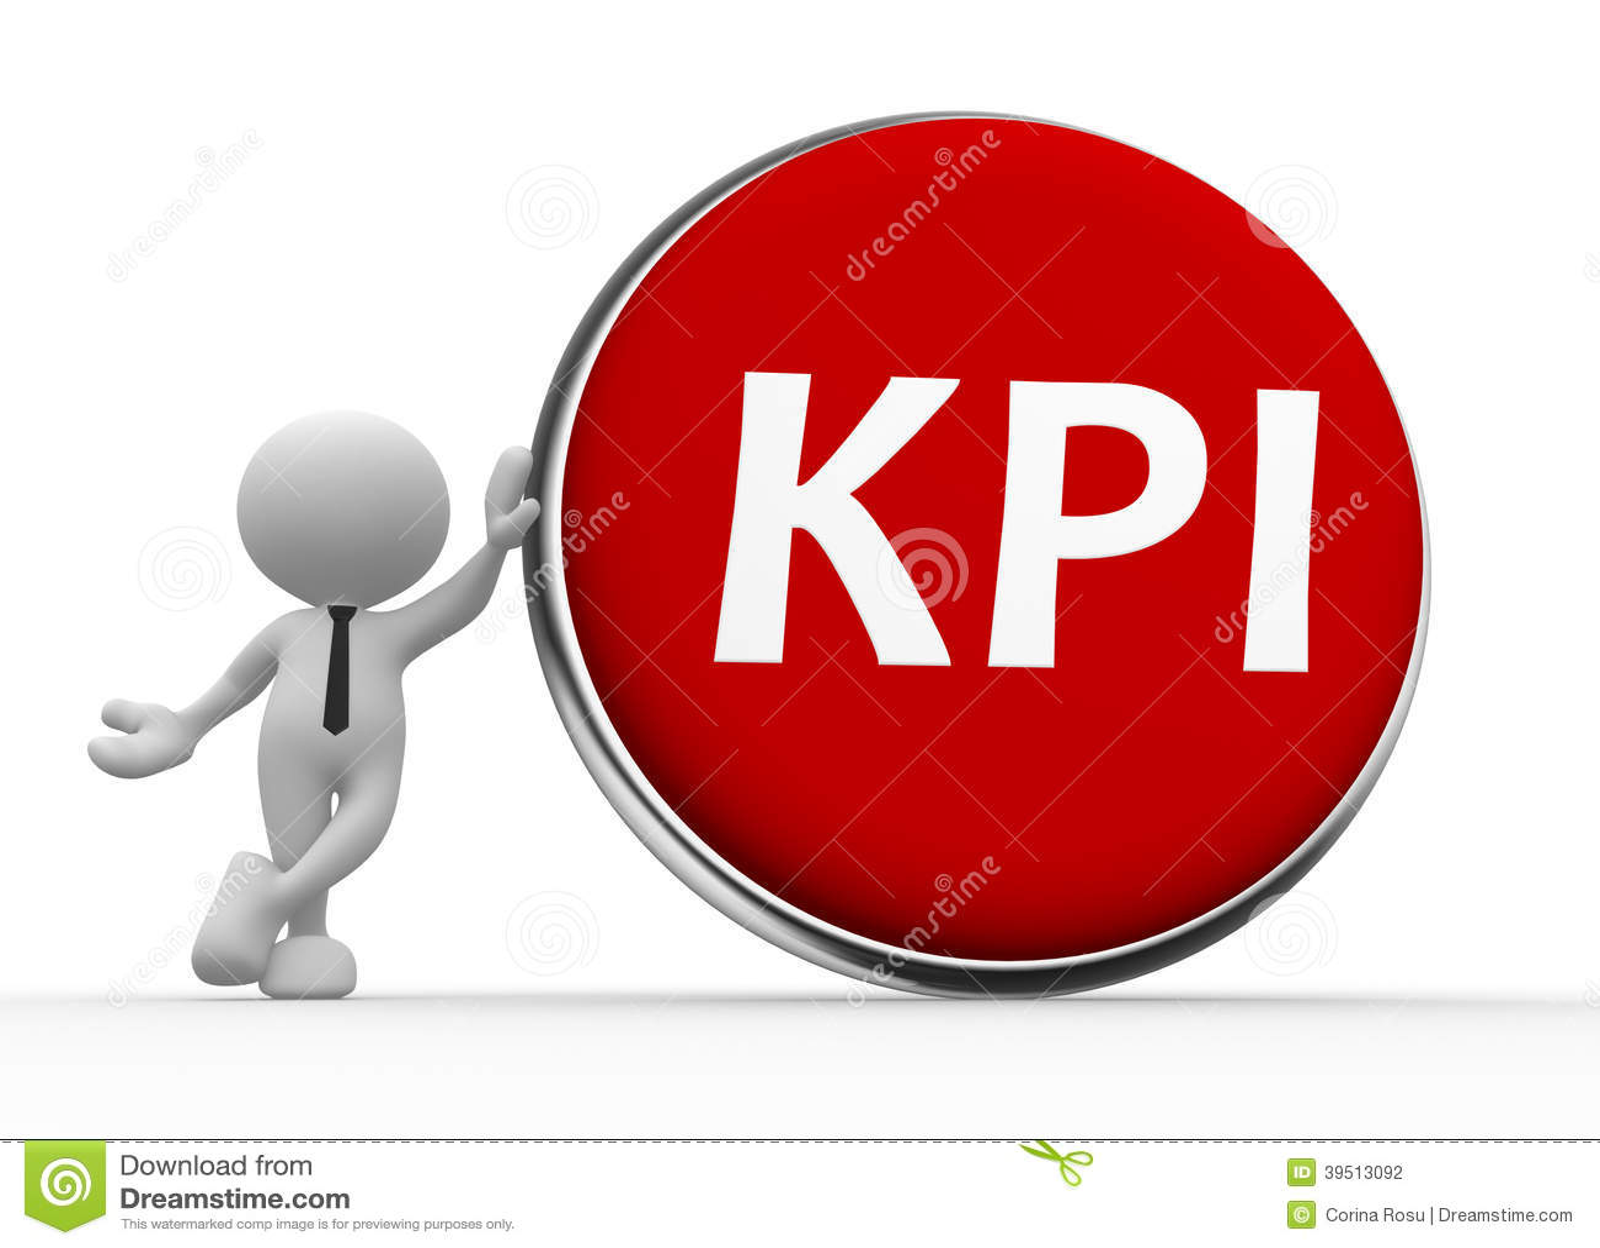 Kpi Key Performance Indicator Button Stock